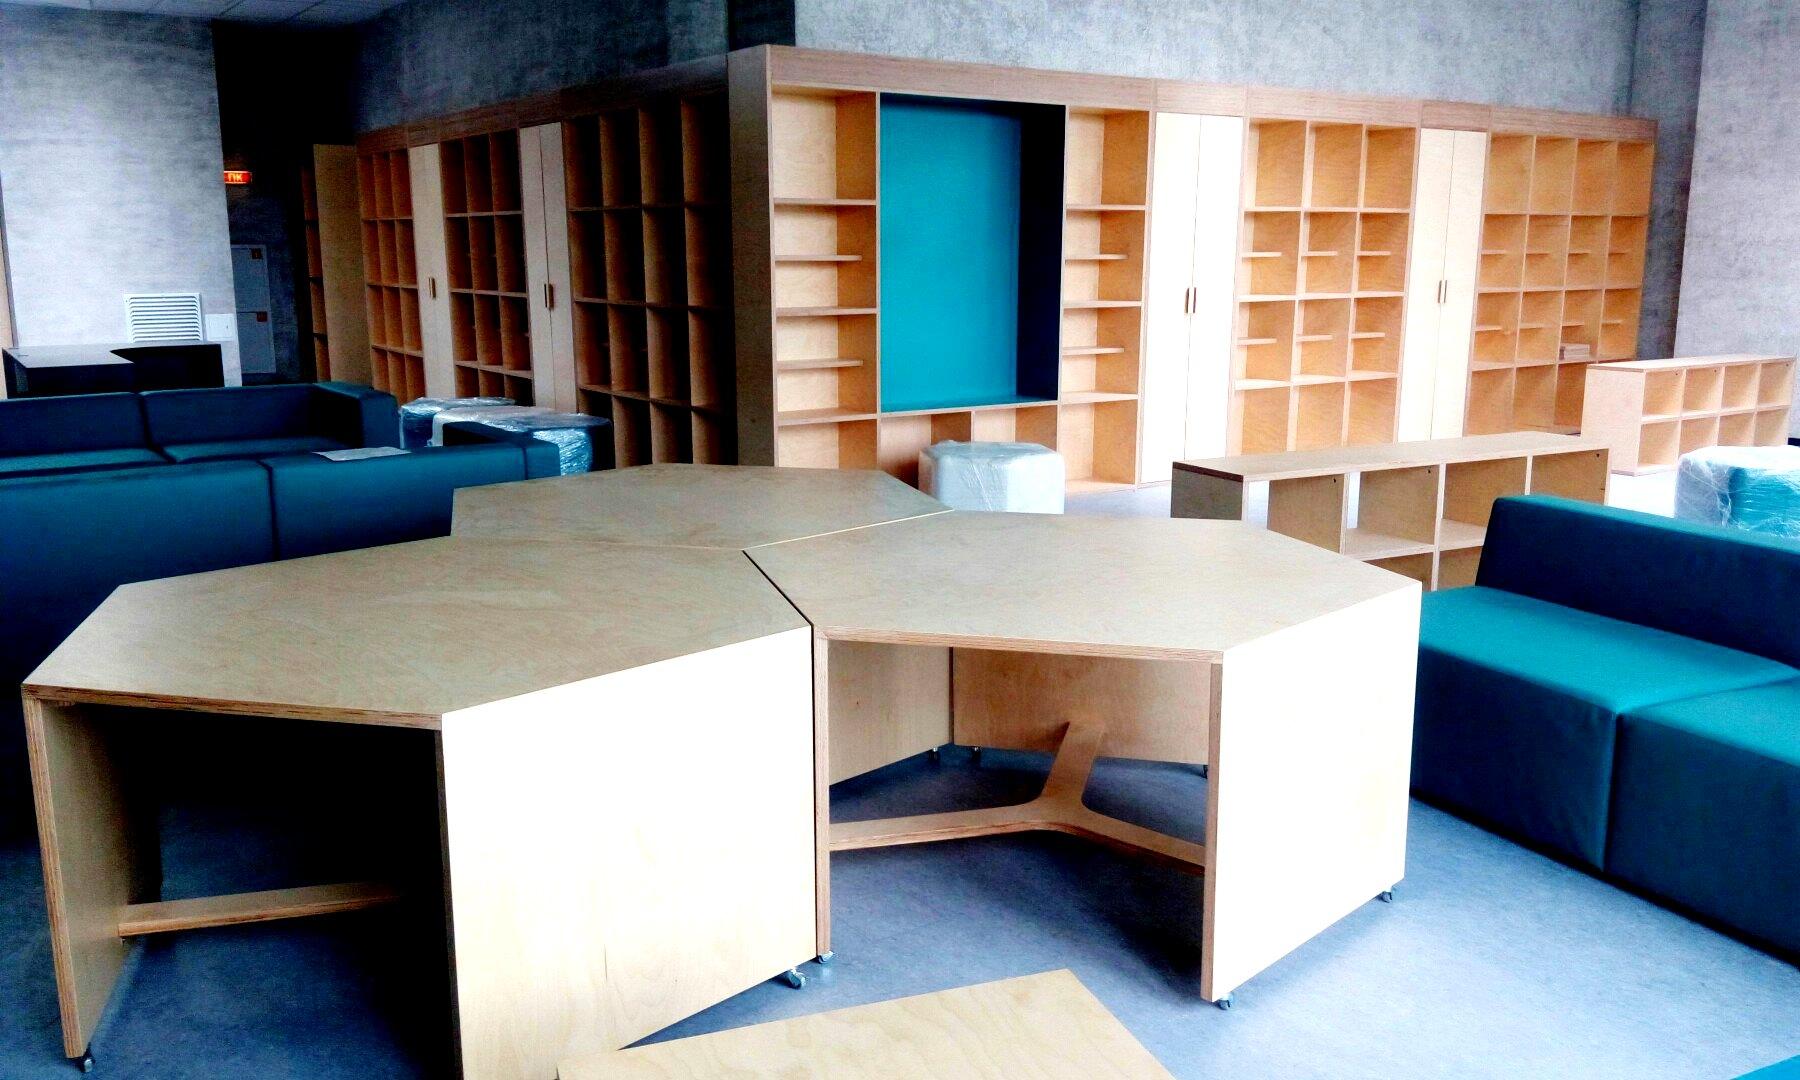 мебель и интерьер из фанеры (1)